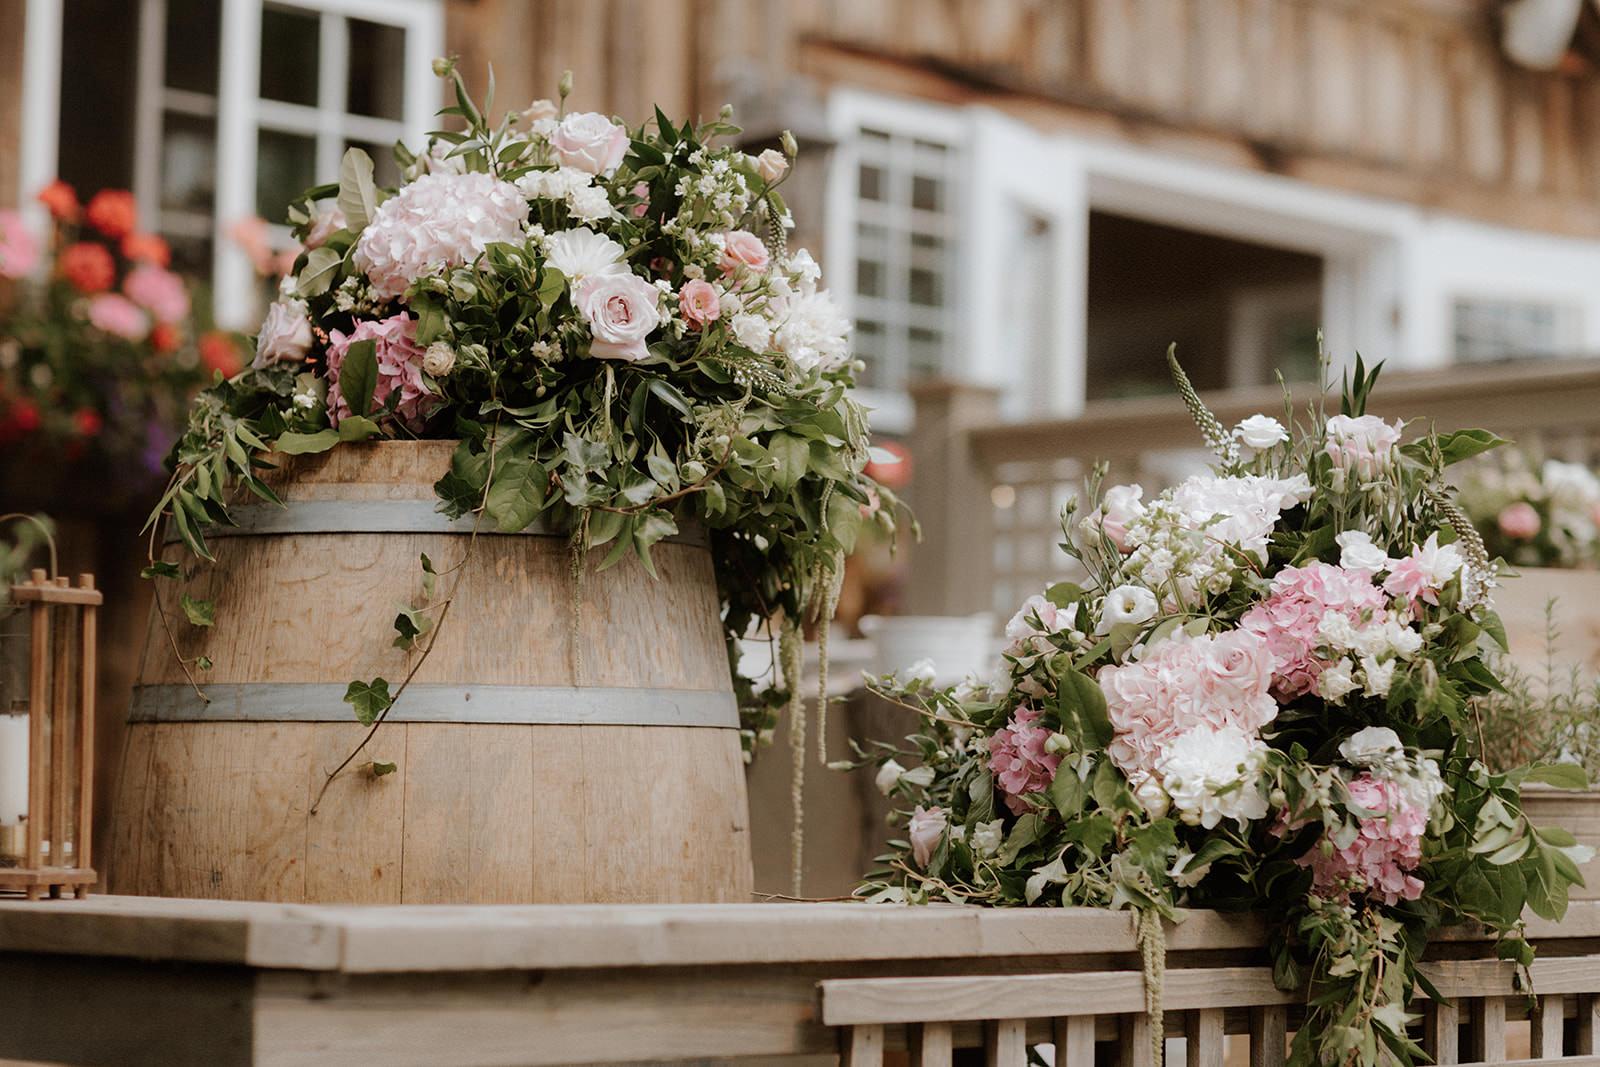 Rustic Floral Arrangements on Wine Barrels Anvil Island Wedding